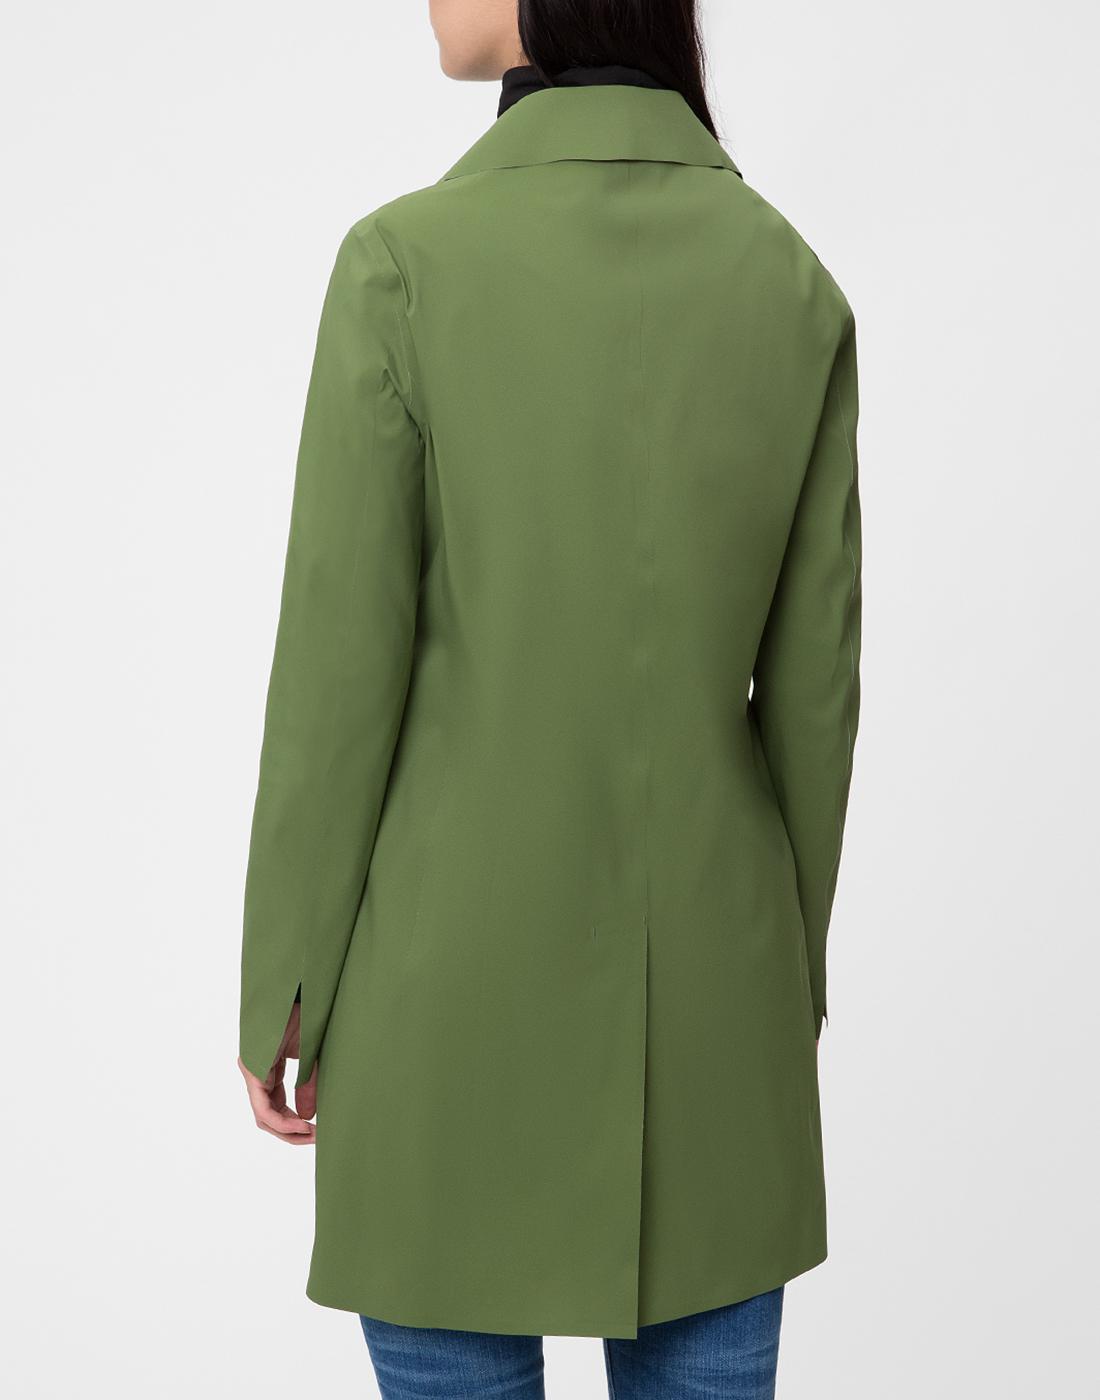 Женский зеленый плащ Herno SIM0035D-19289-7012-4